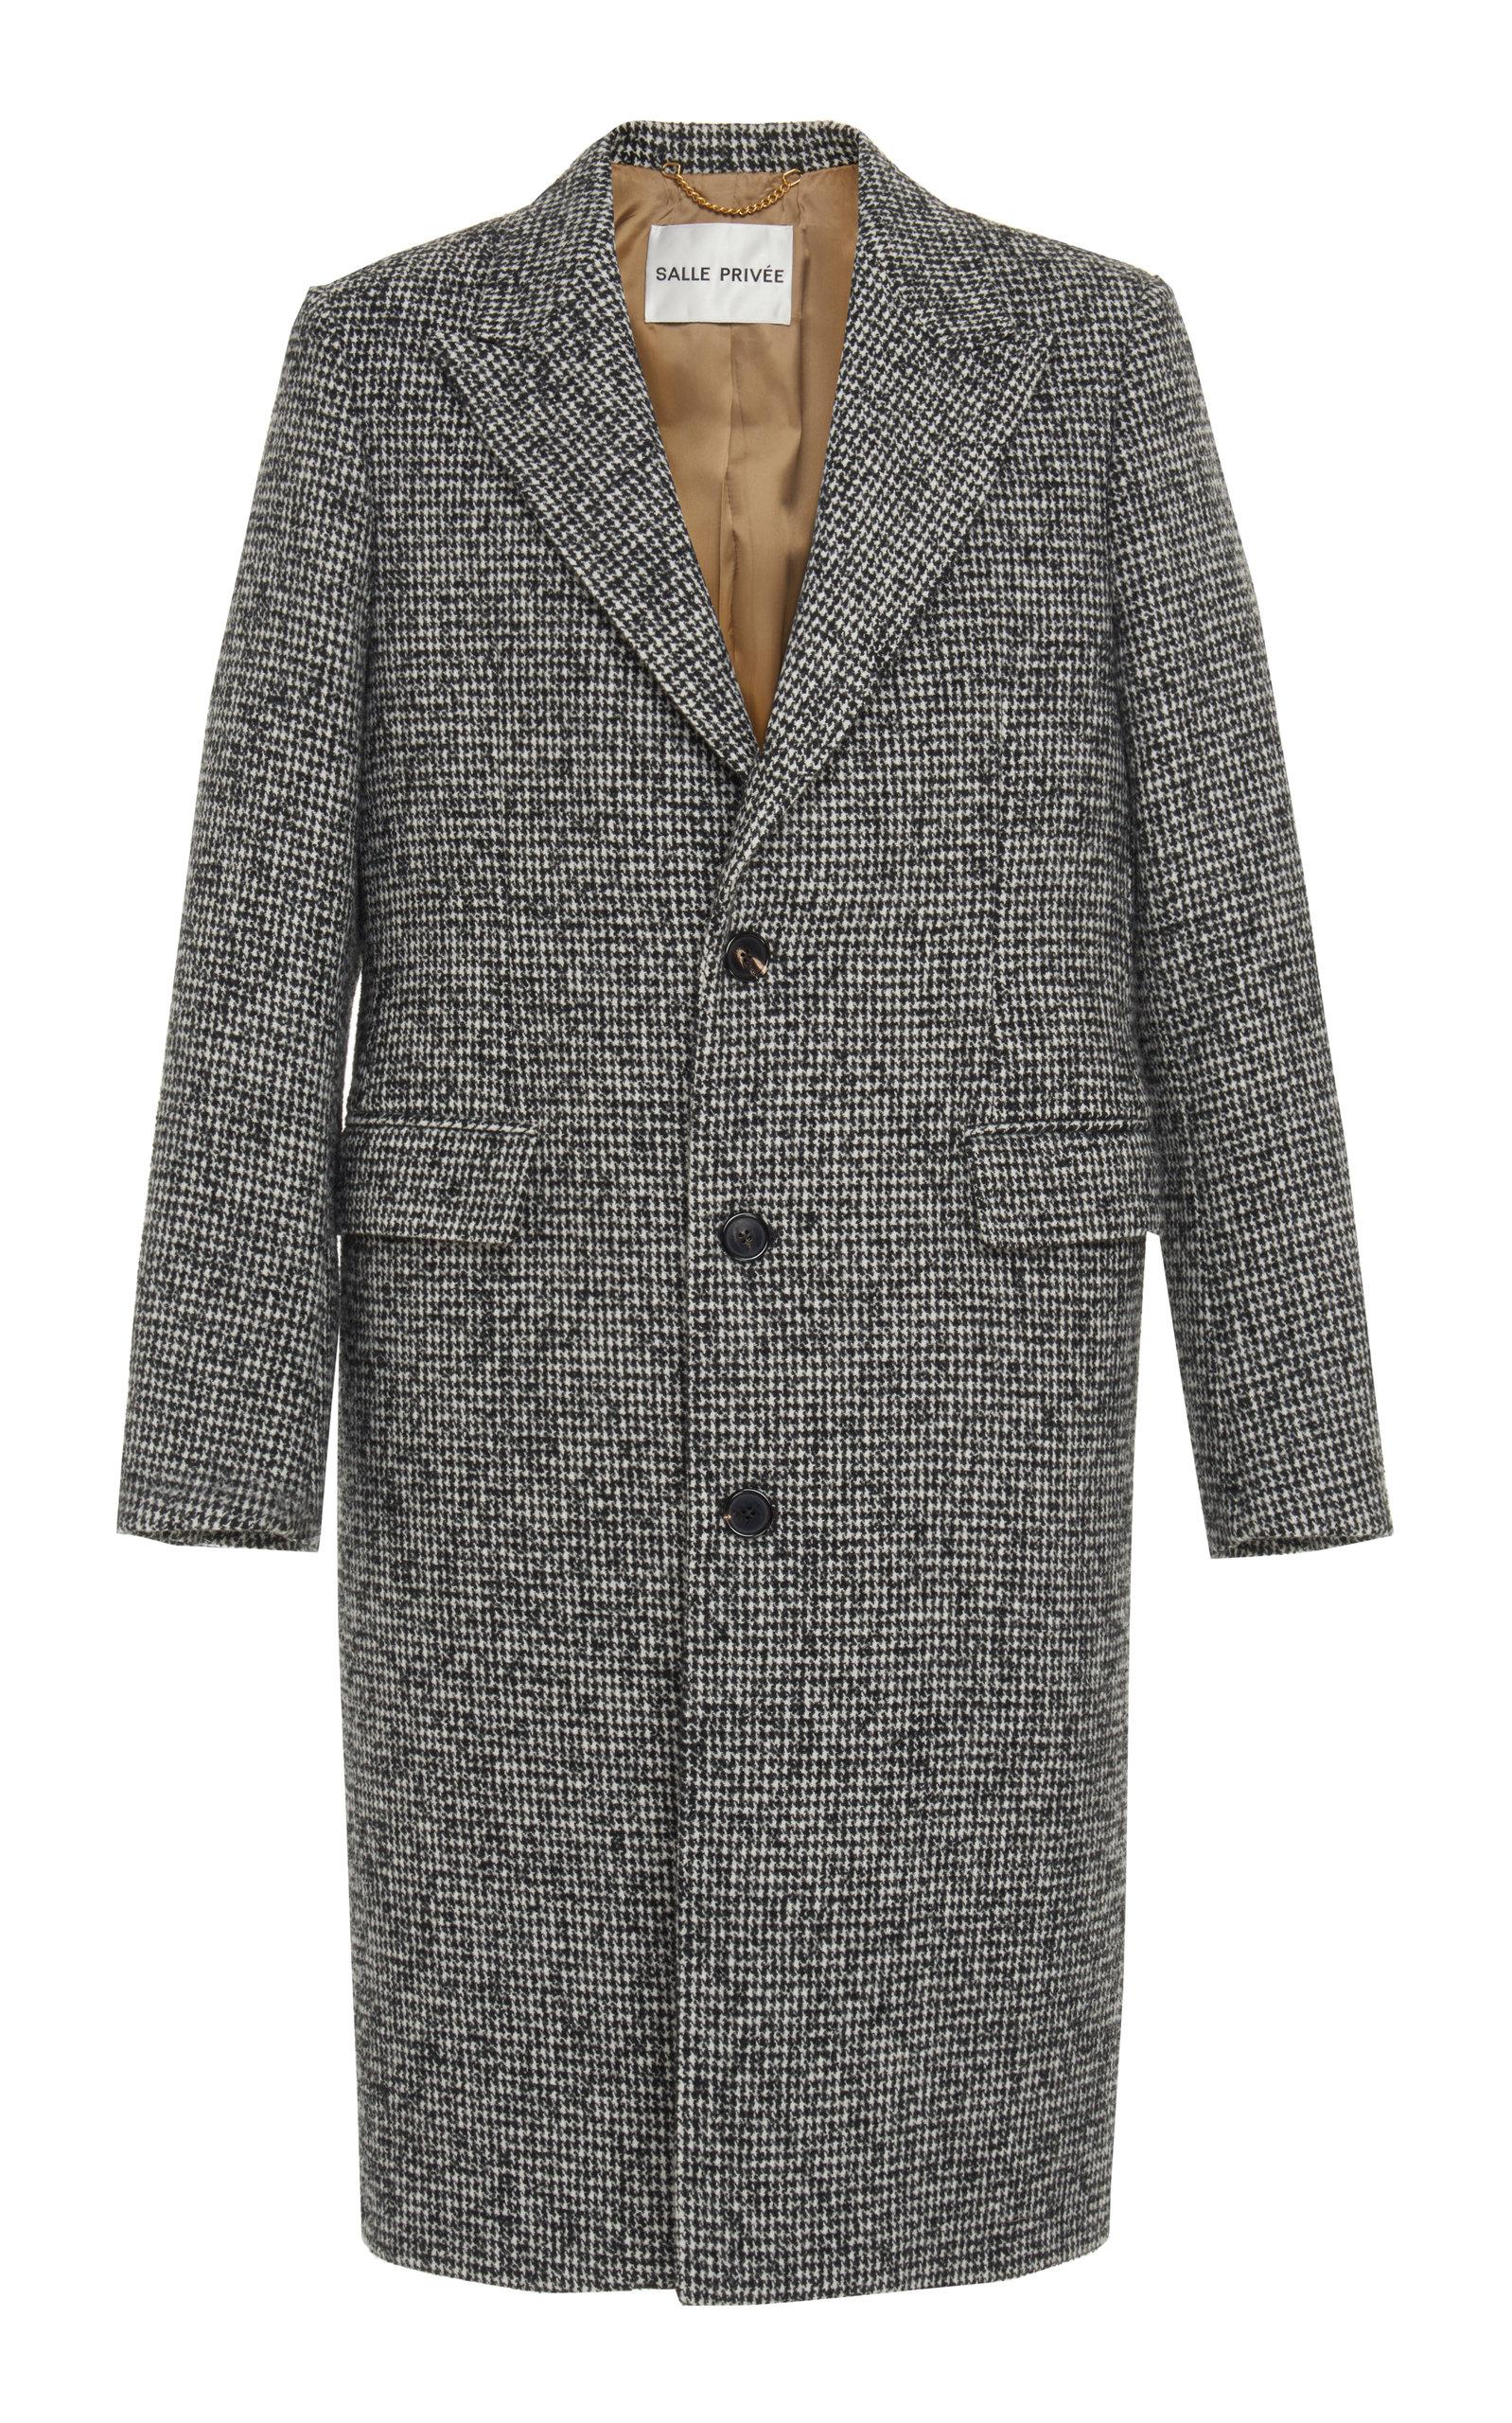 SALLE PRIVÉE Adrian Houndstooth Wool-Blend Overcoat - Gray in Black/White